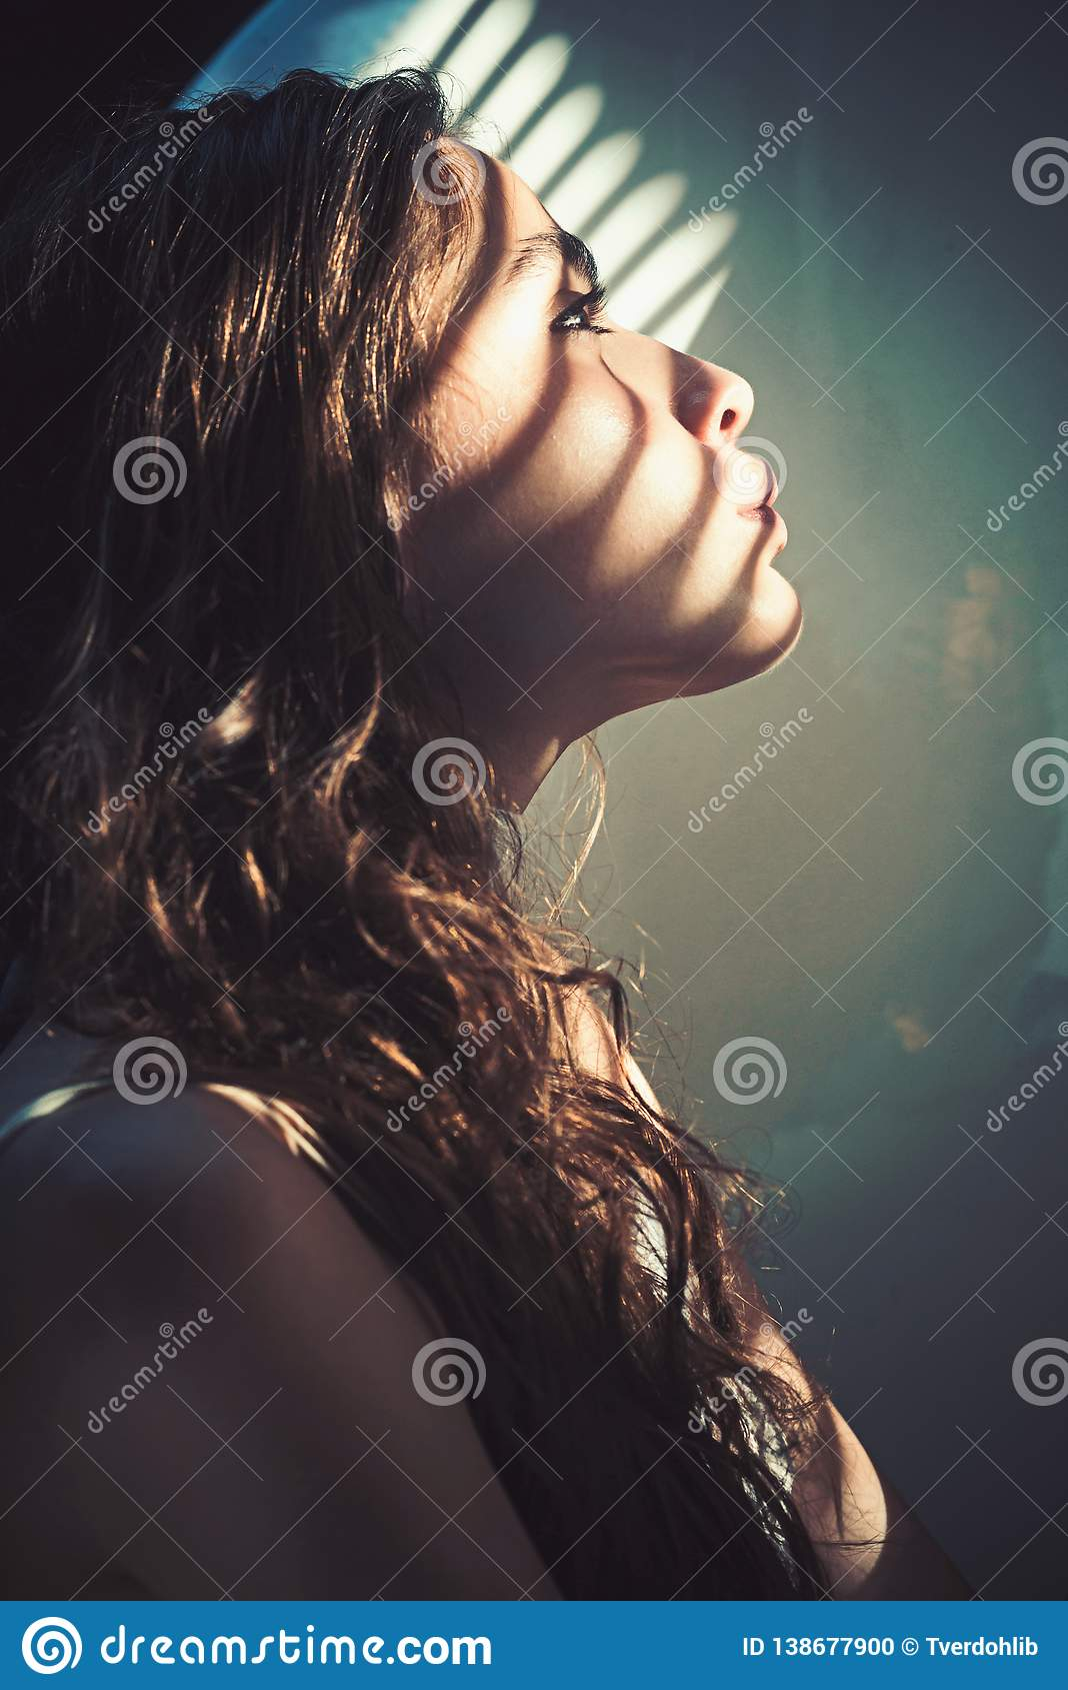 Wellness και υγεία SPA Γυναίκα με το φως και σκιά από τα παραθυρόφυλλα στο νέο δέρμα προσώπου Η γυναίκα με το φυσικό makeup χαλαρ